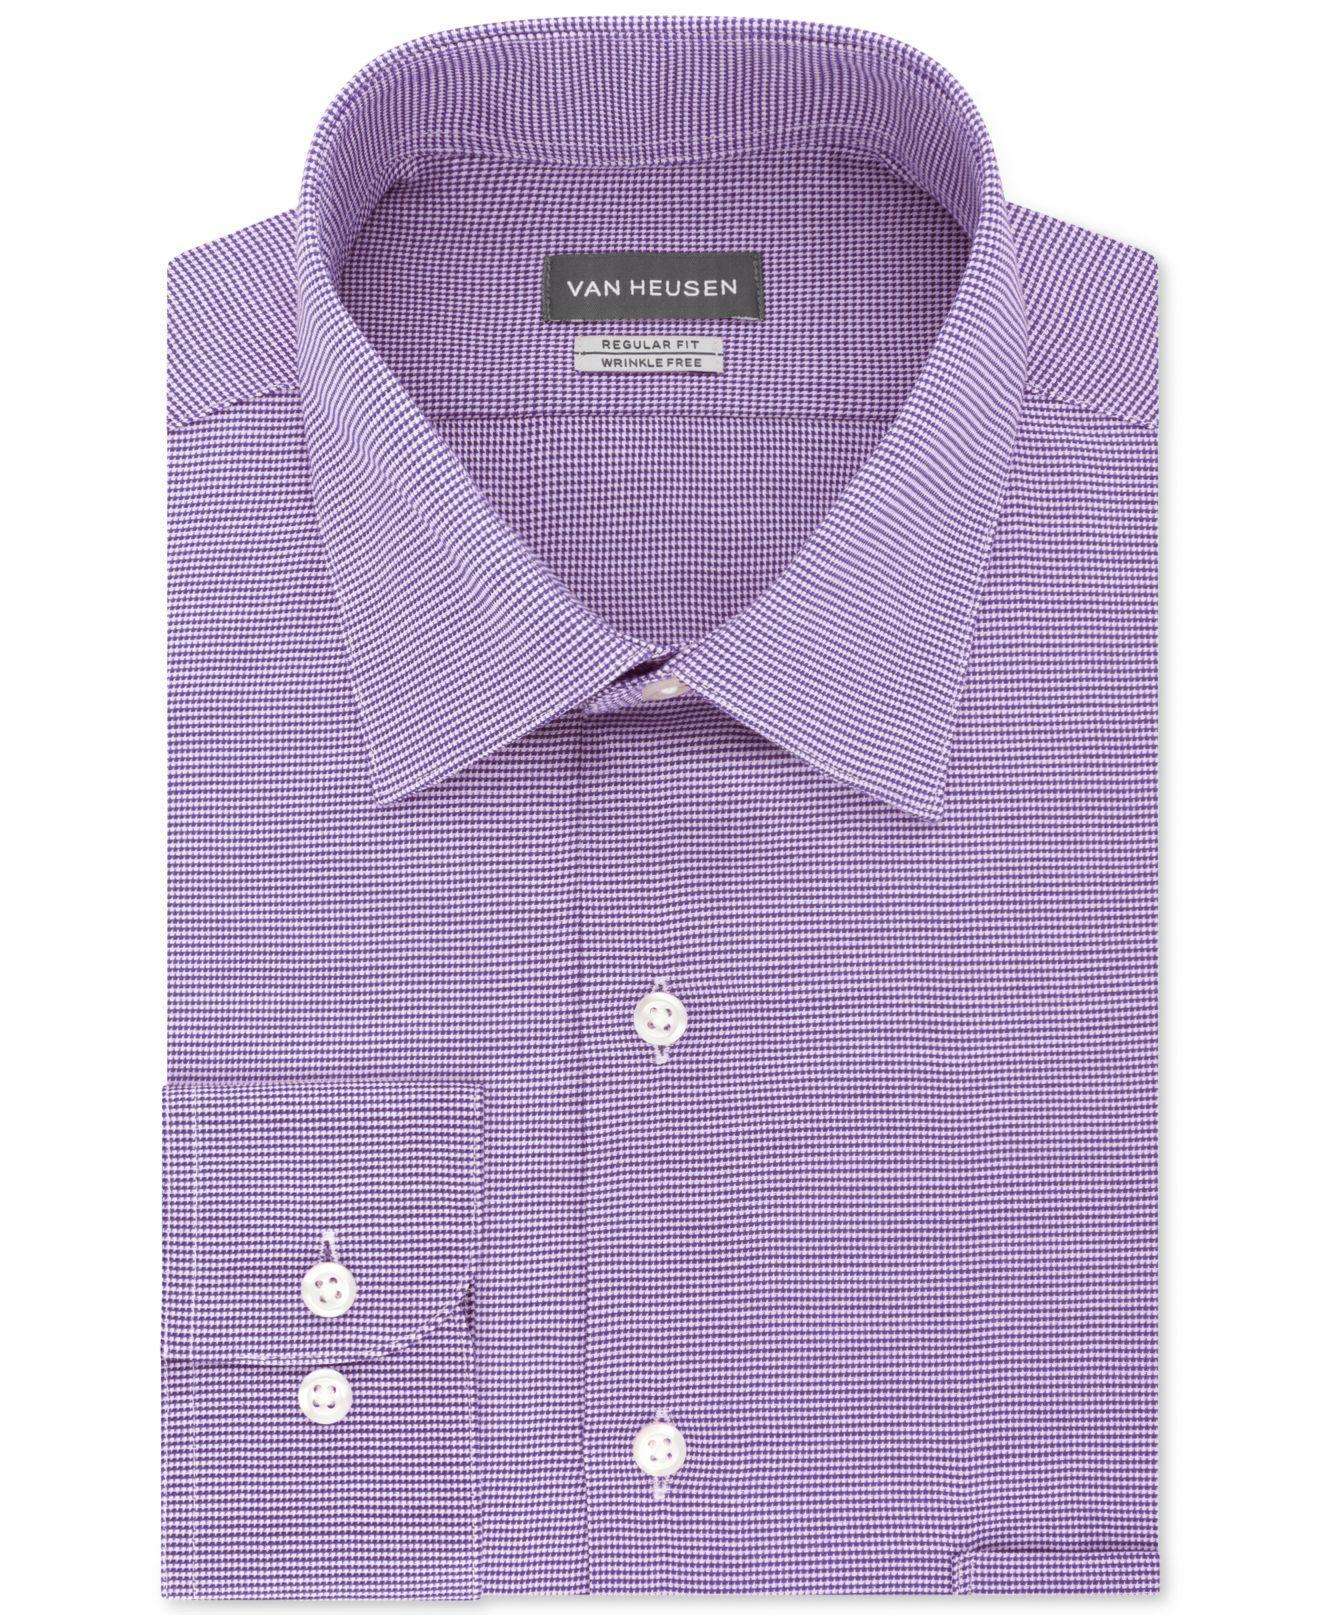 Van Heusen Dress Shirt Mens Slim-Fit Short Sleeve Casual Stretch Button Front